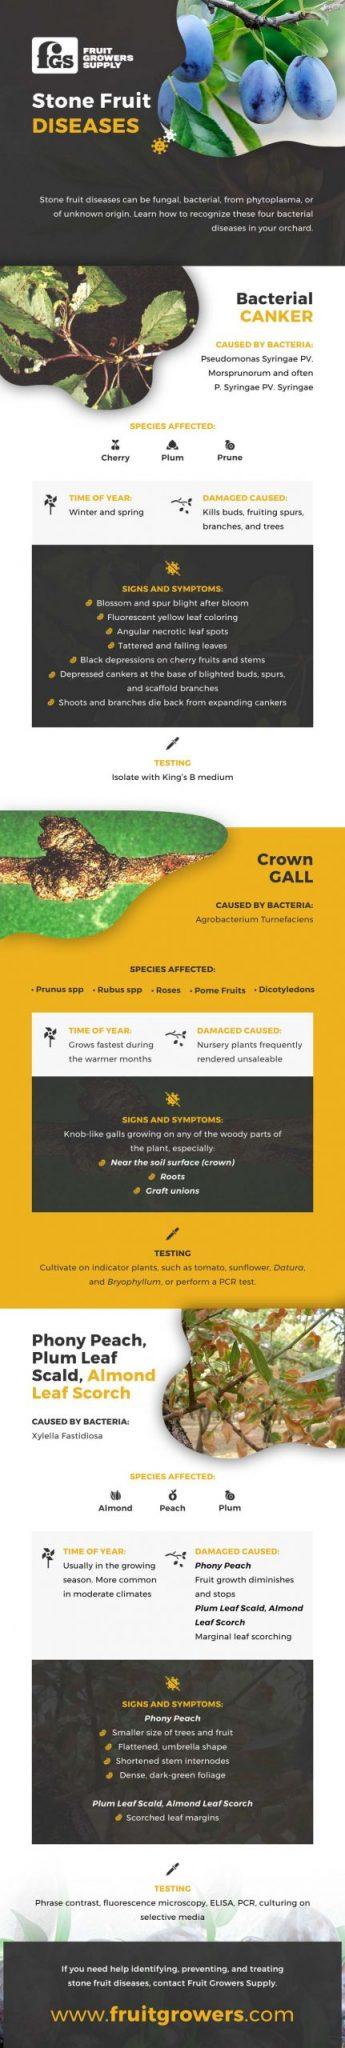 Stone Fruit Diseases Infographic - FruitGrowers